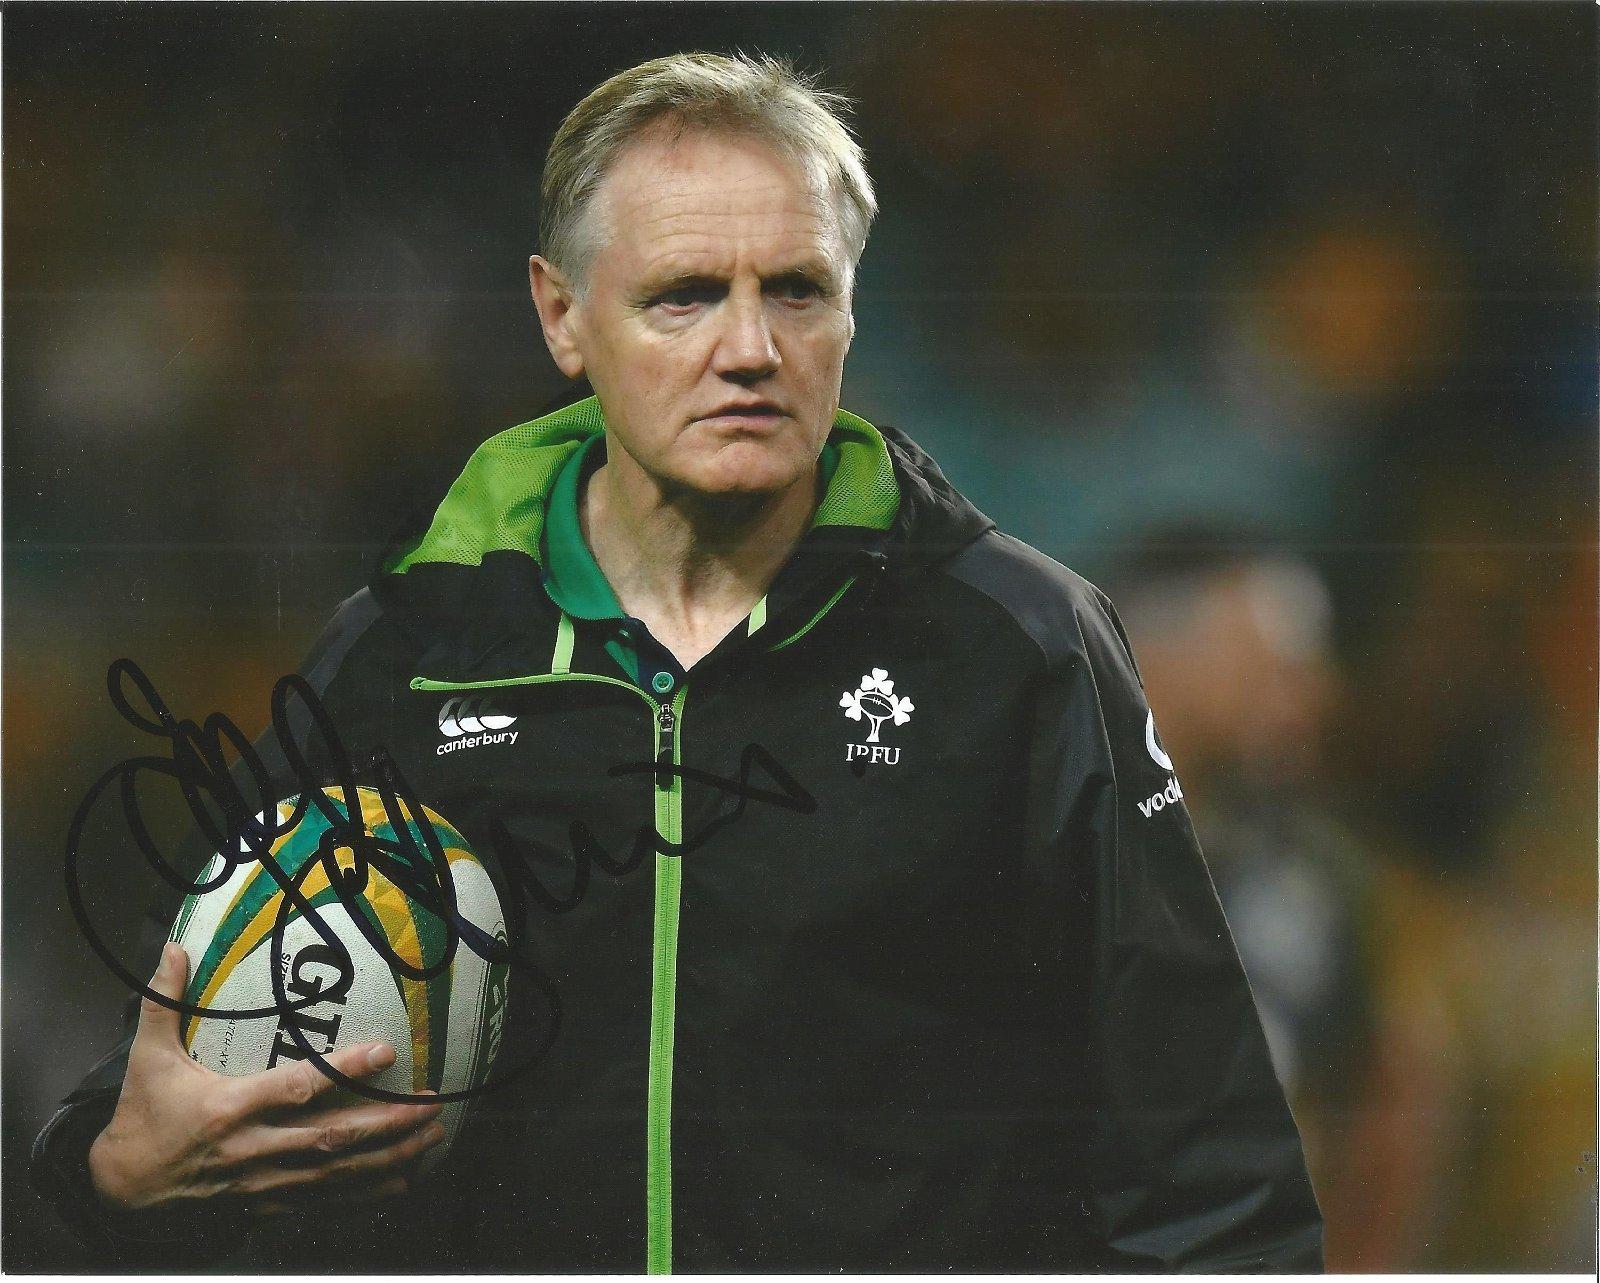 Joe Schmidt Signed Ireland Rugby Coach 8x10 Photo. Good